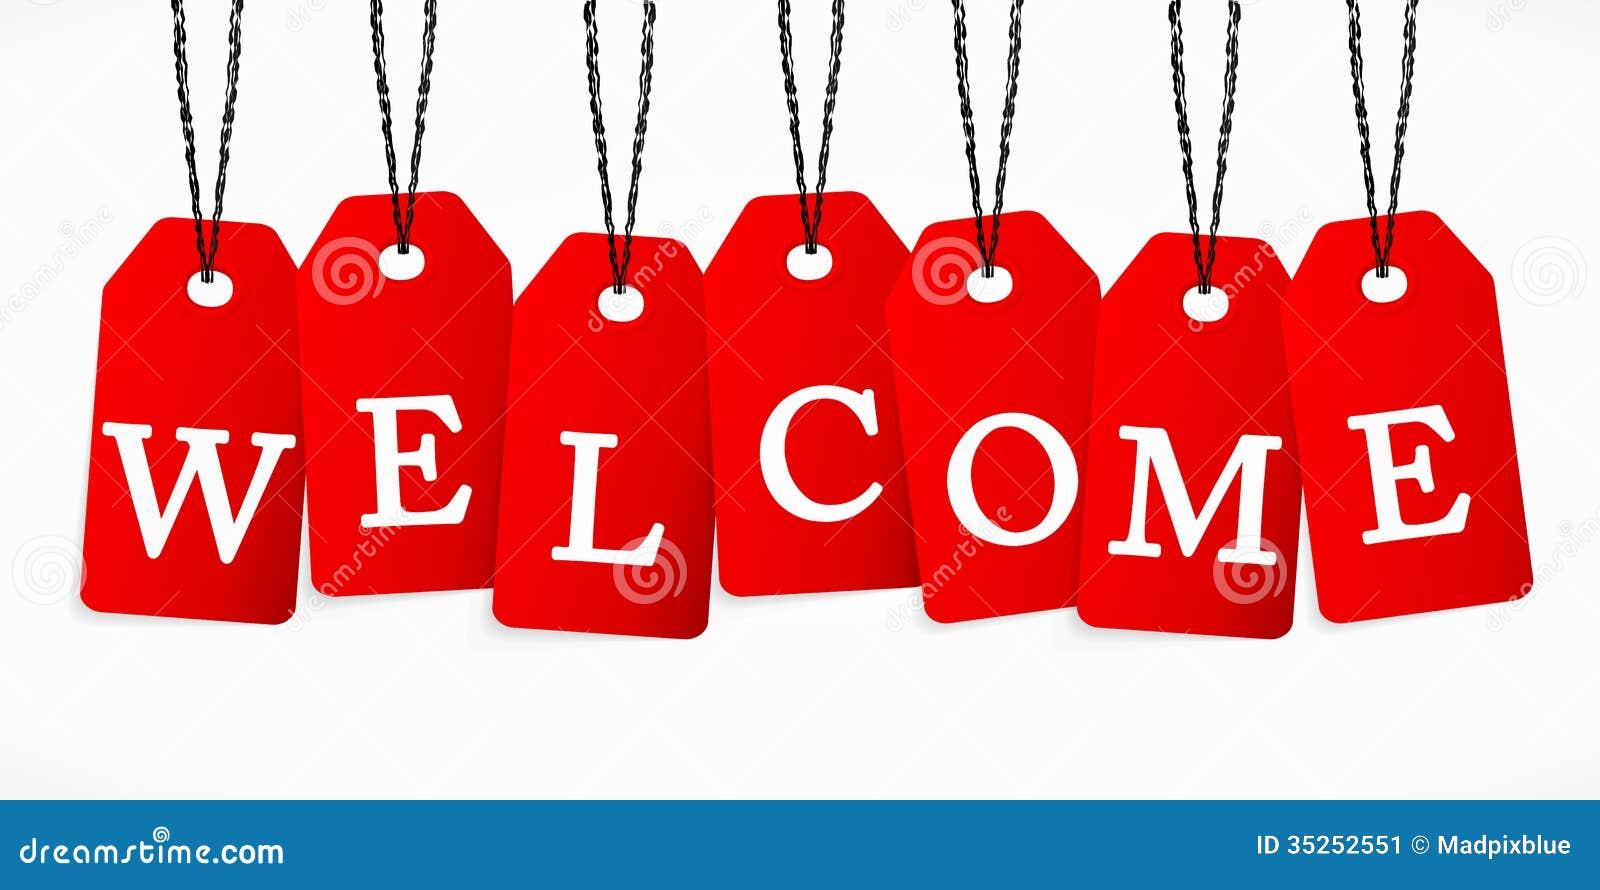 Welcome Stock Image Image 35252551